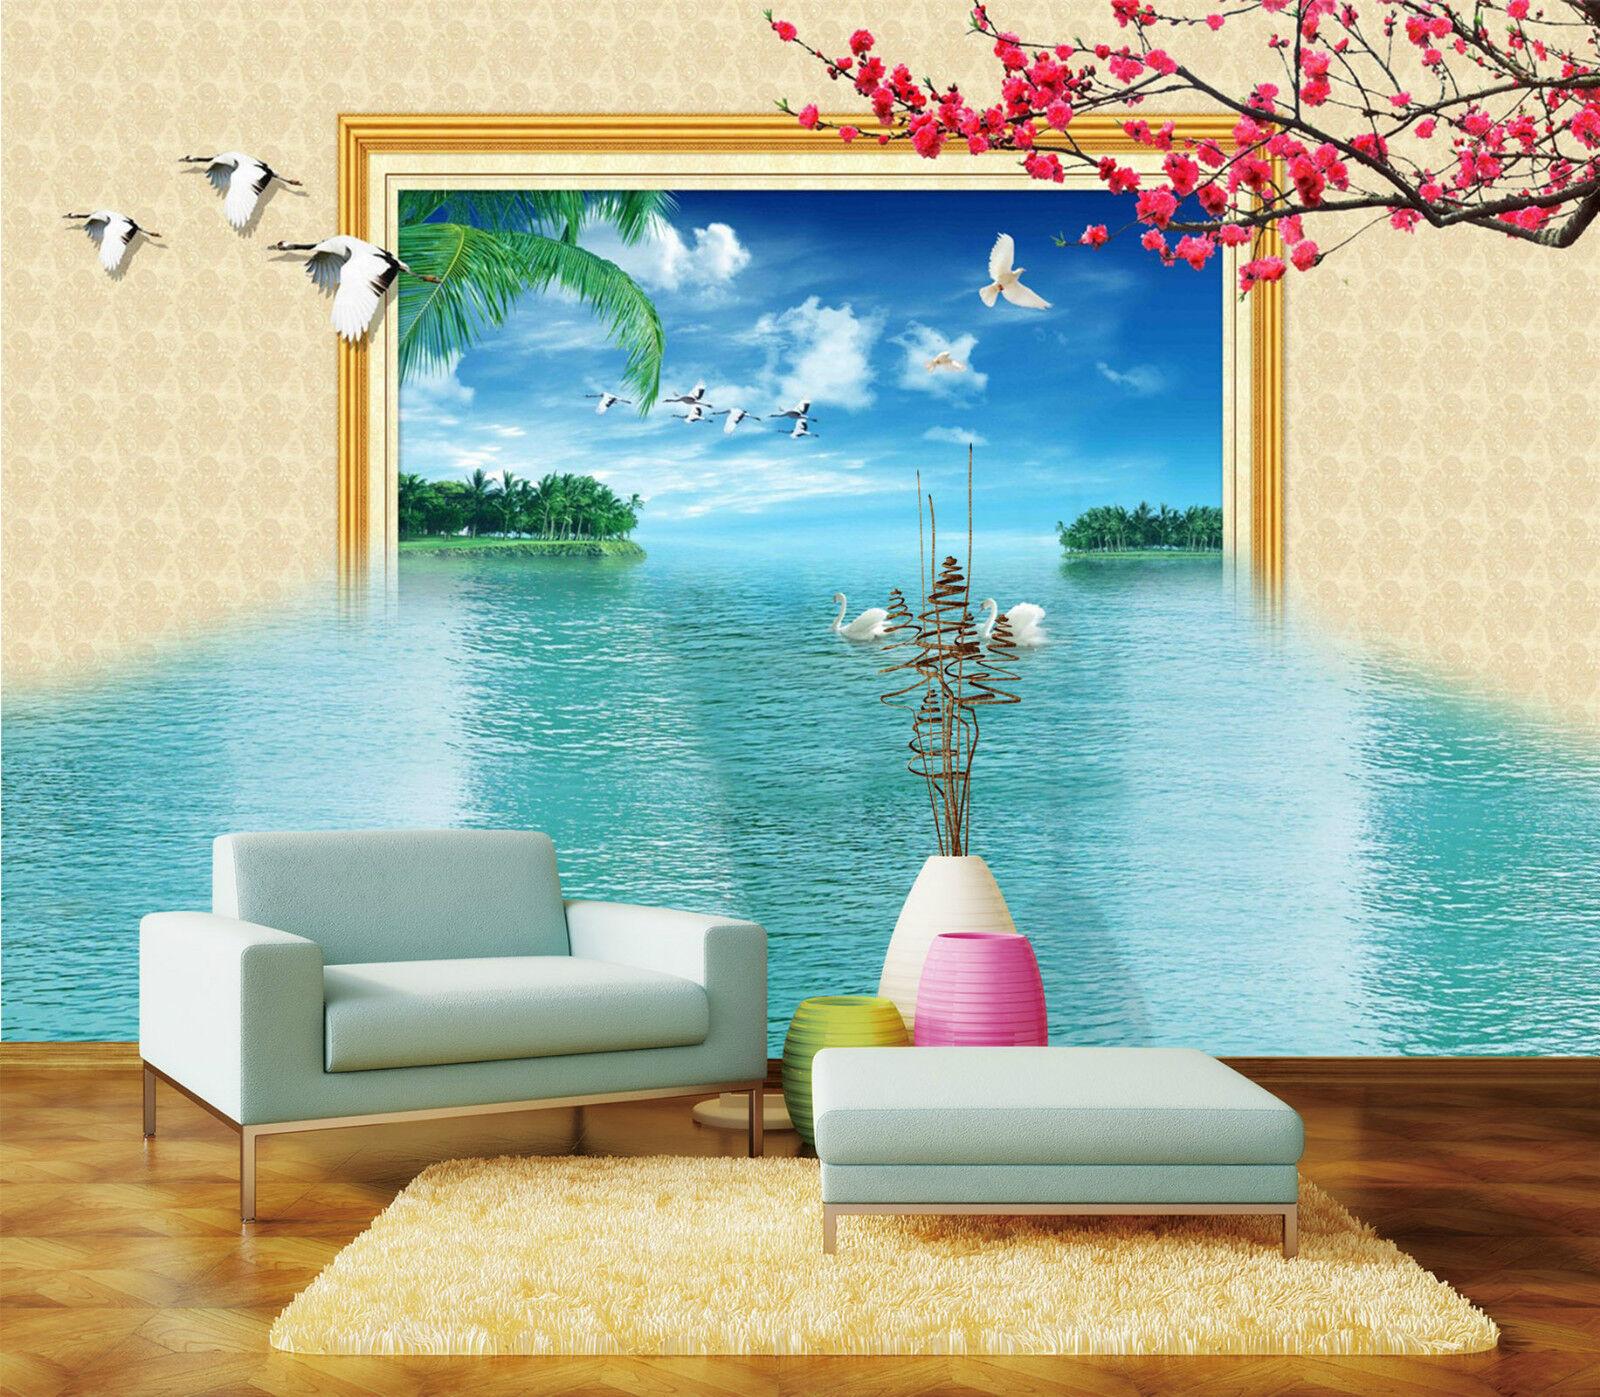 3D Seen Vogel 930 Fototapeten Wandbild Fototapete Bild Tapete Familie Kinder DE